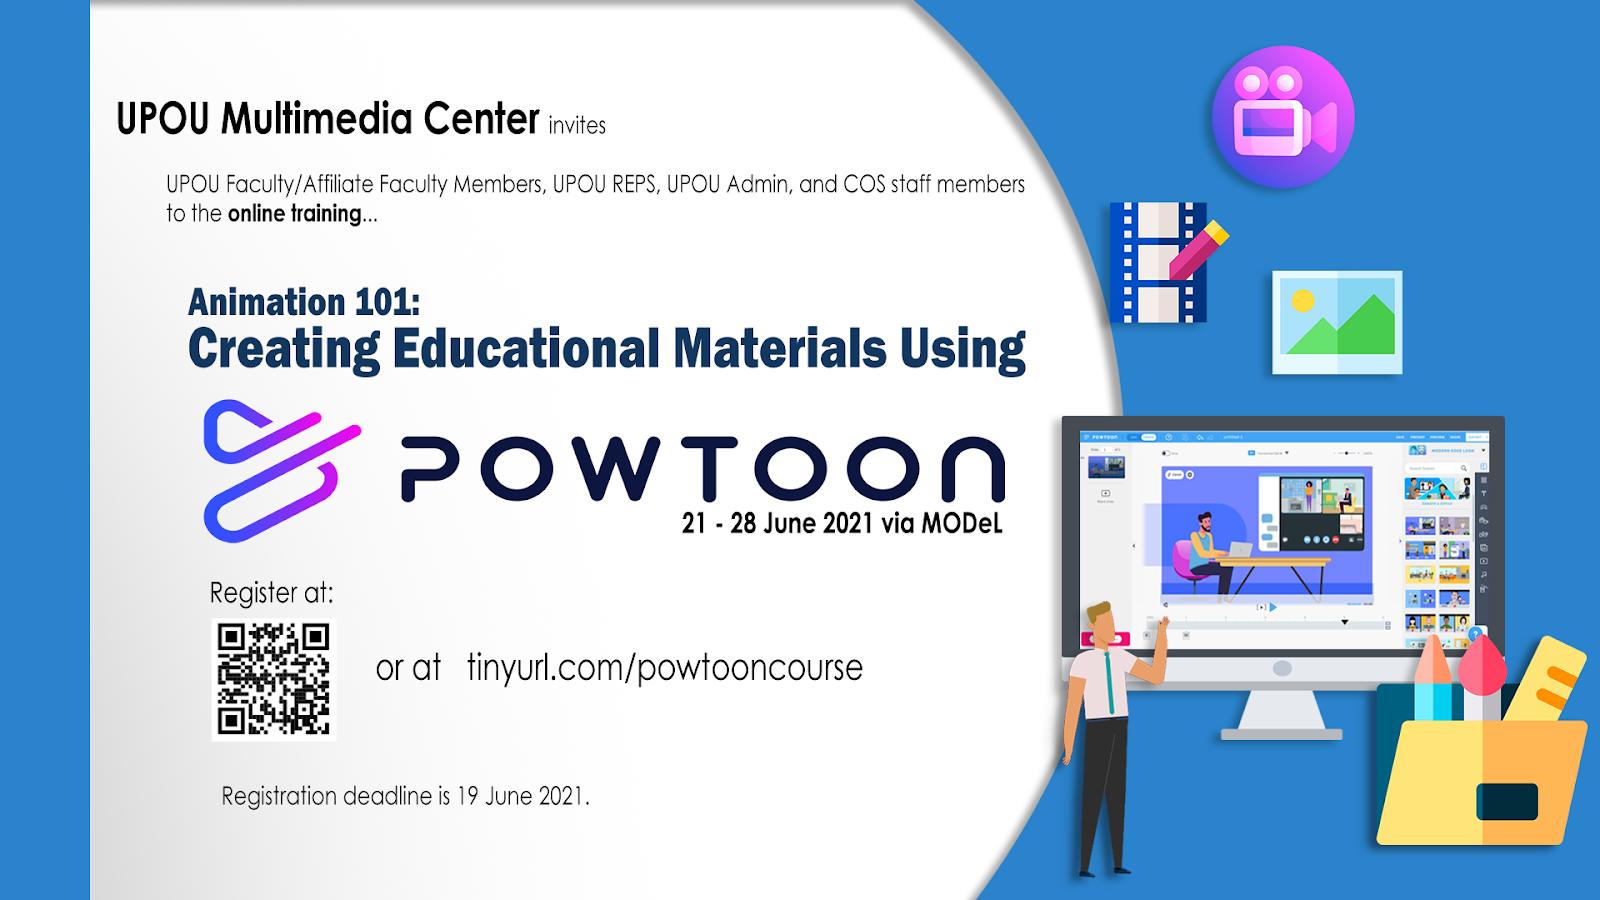 UPOU Multimedia Center conduct training programs